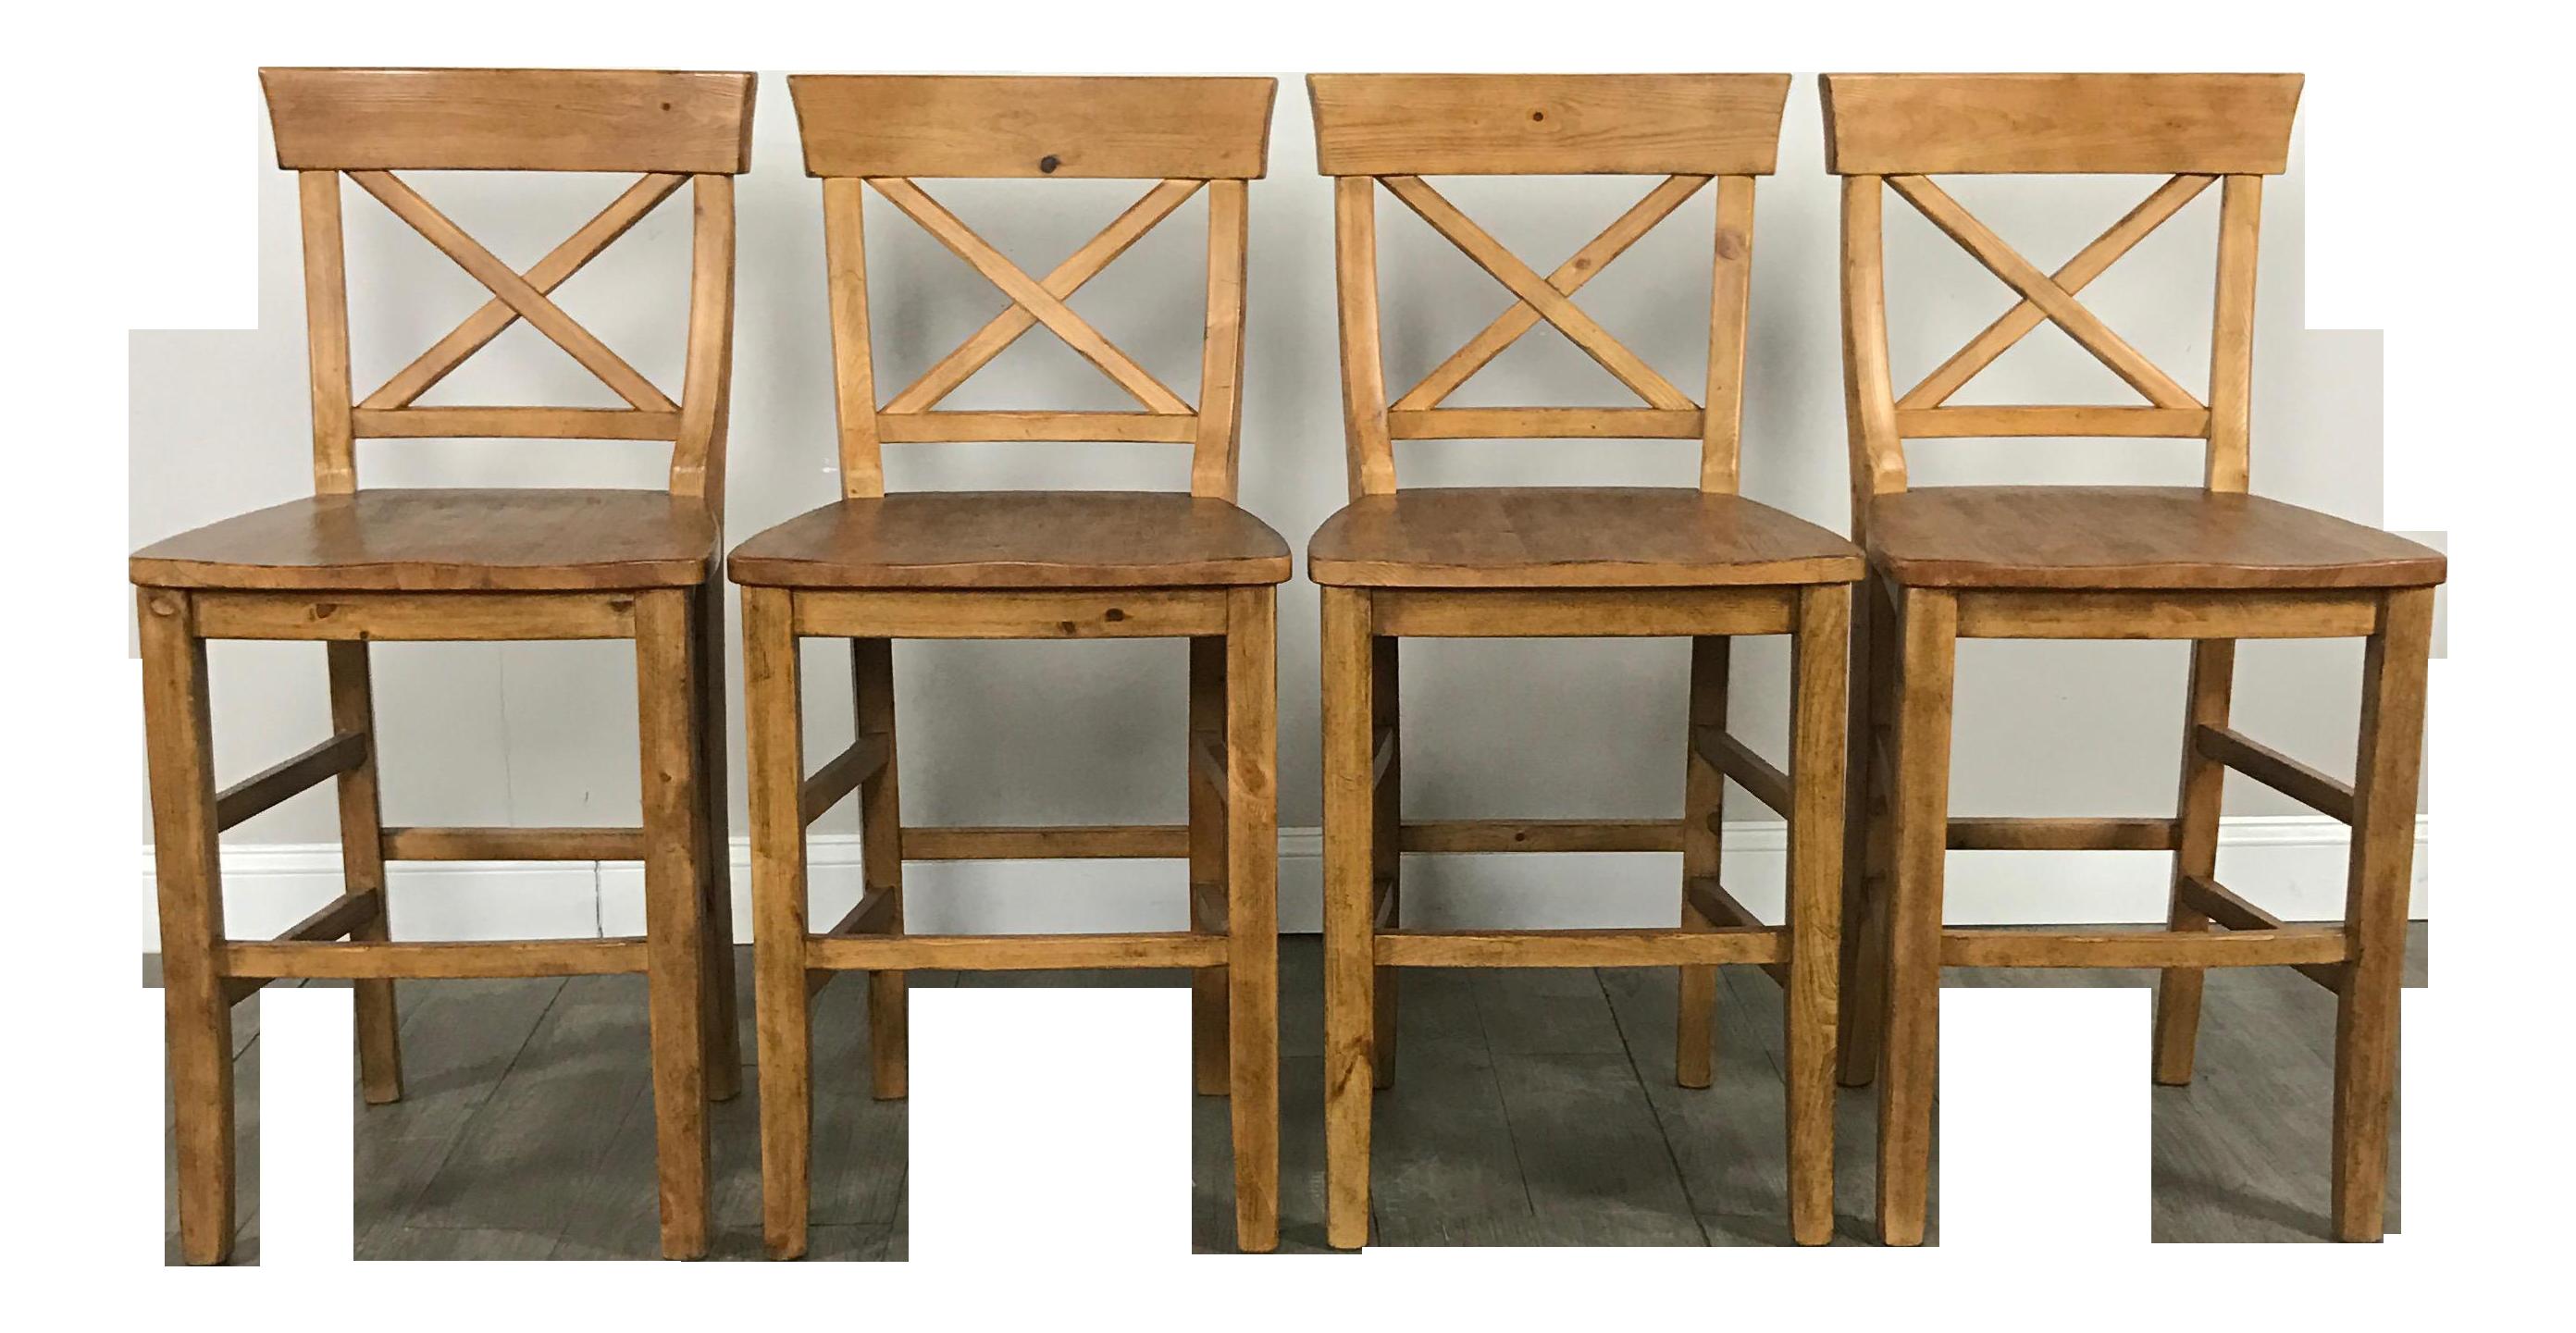 Rustic Pottery Barn Bar Stools Set Of 4 Chairish